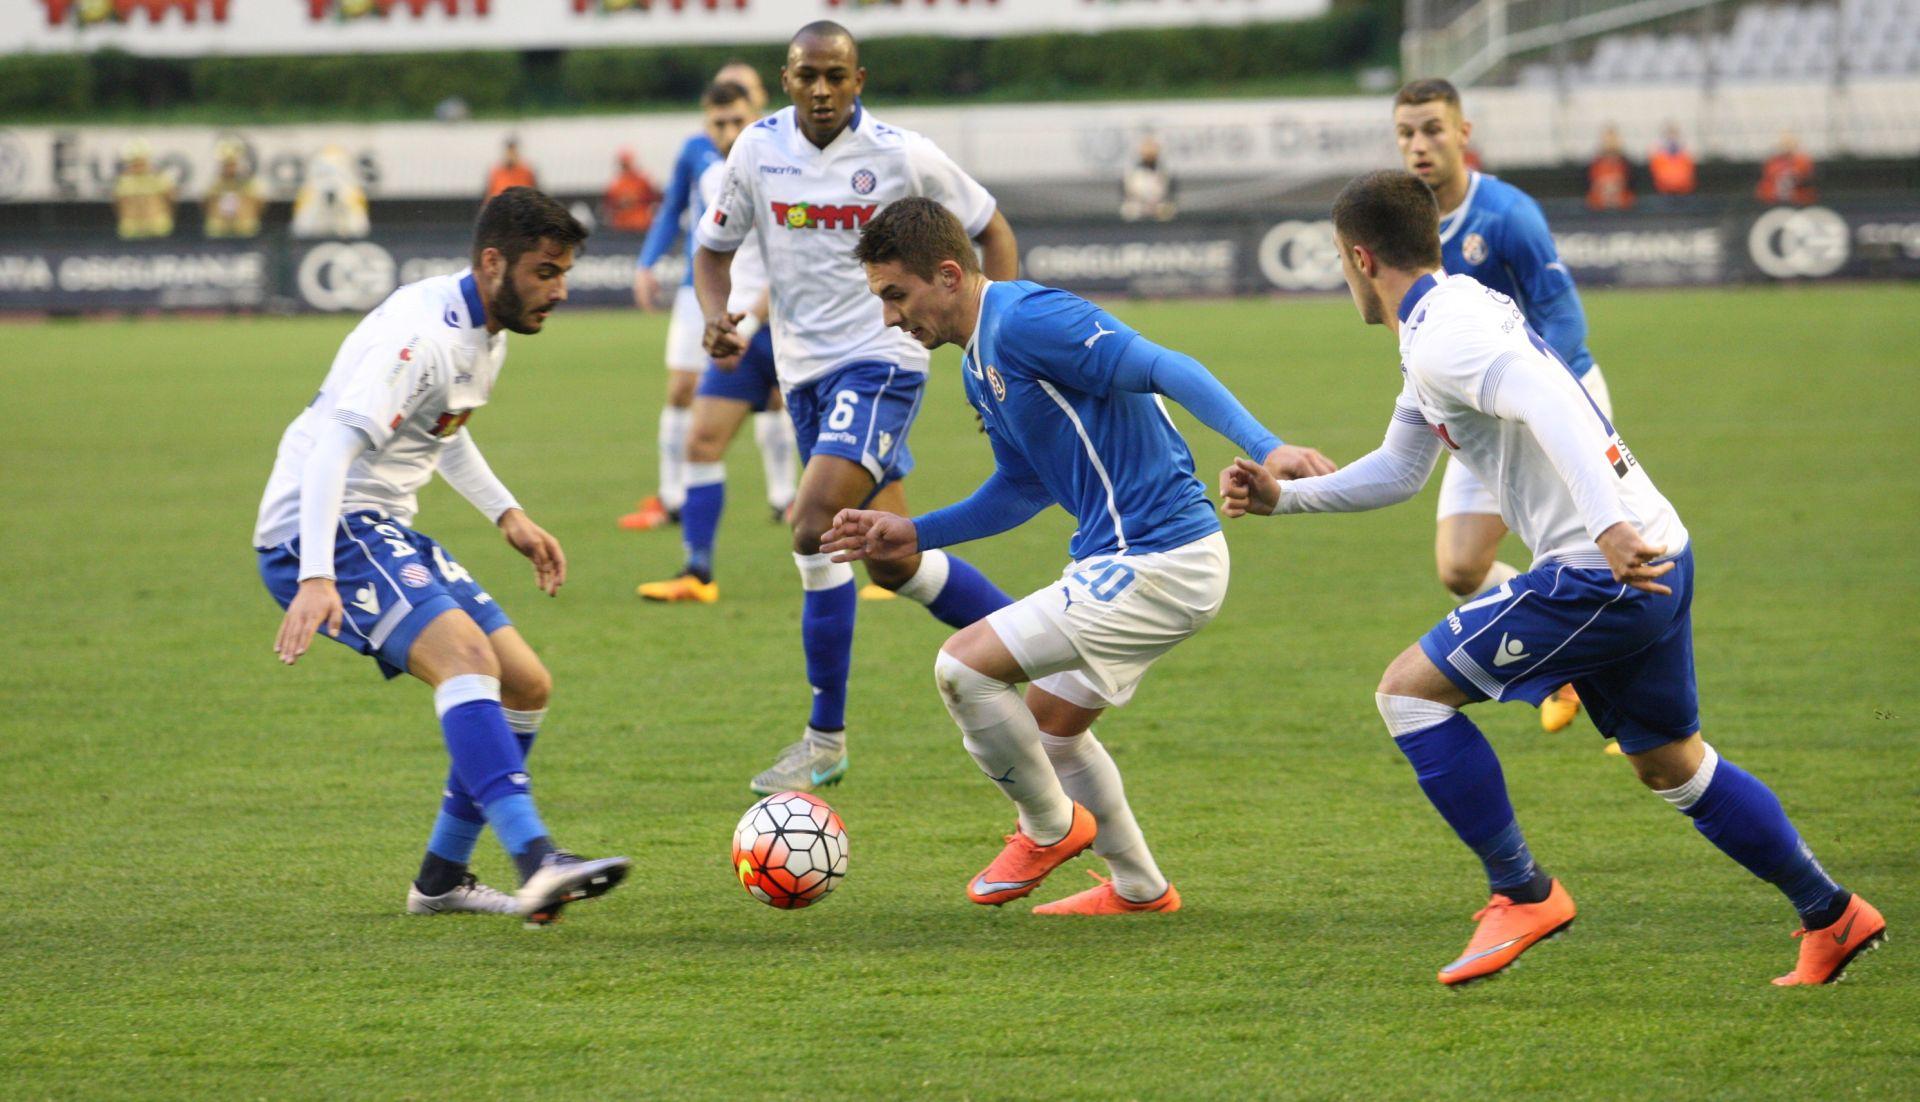 Kup: Hajduk – Dinamo 0-2 (poluvrijeme)